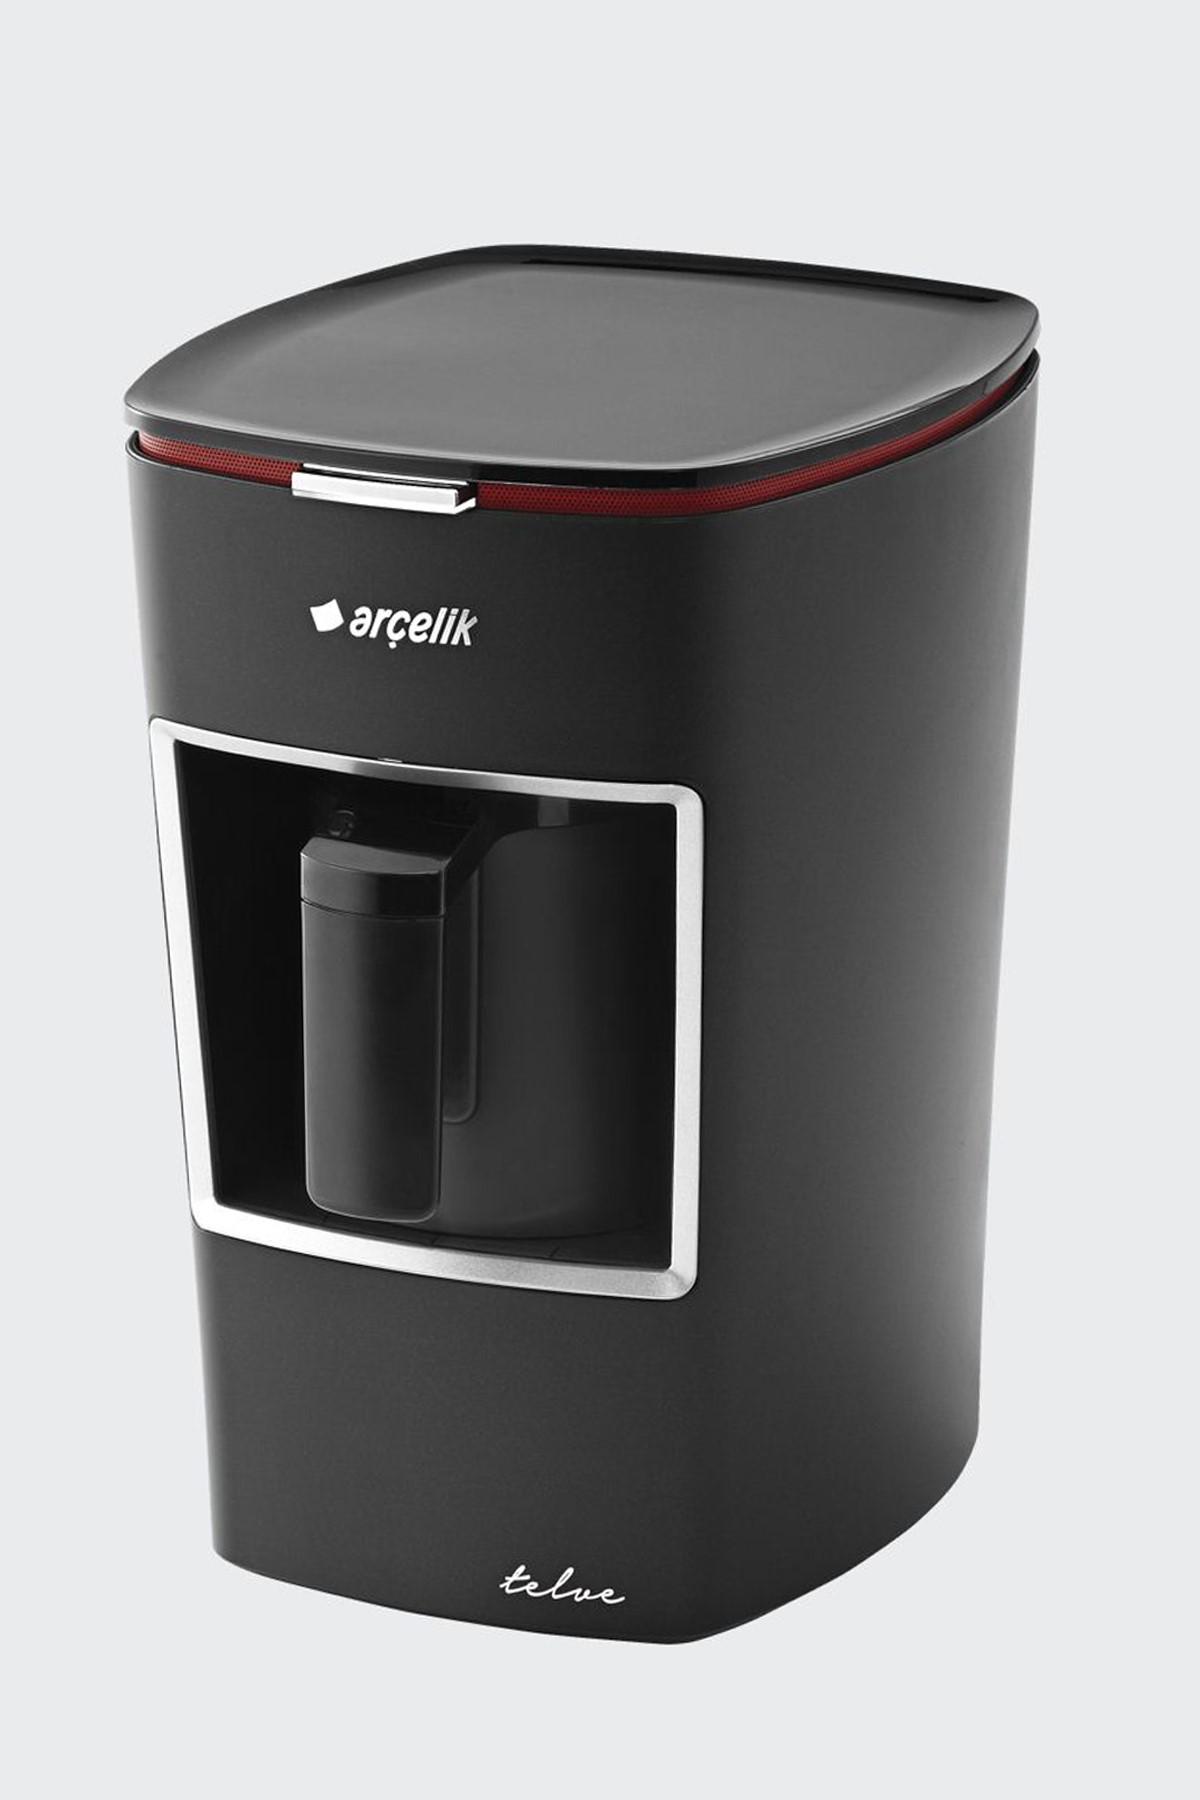 Arcelik Telve Automatic Greek Turkish Coffee Espresso Maker Machine K3300 Beko-red-black-white ...